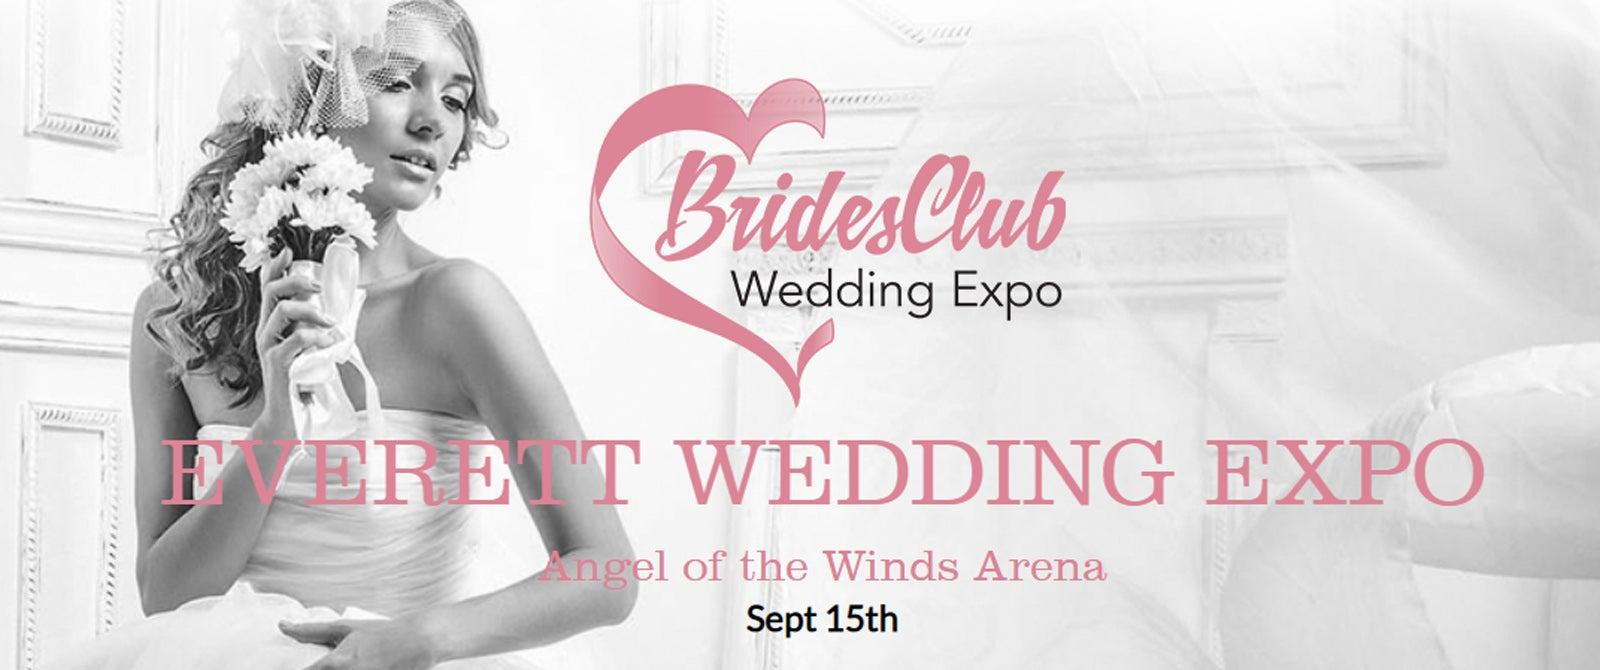 Everett Wedding Expo